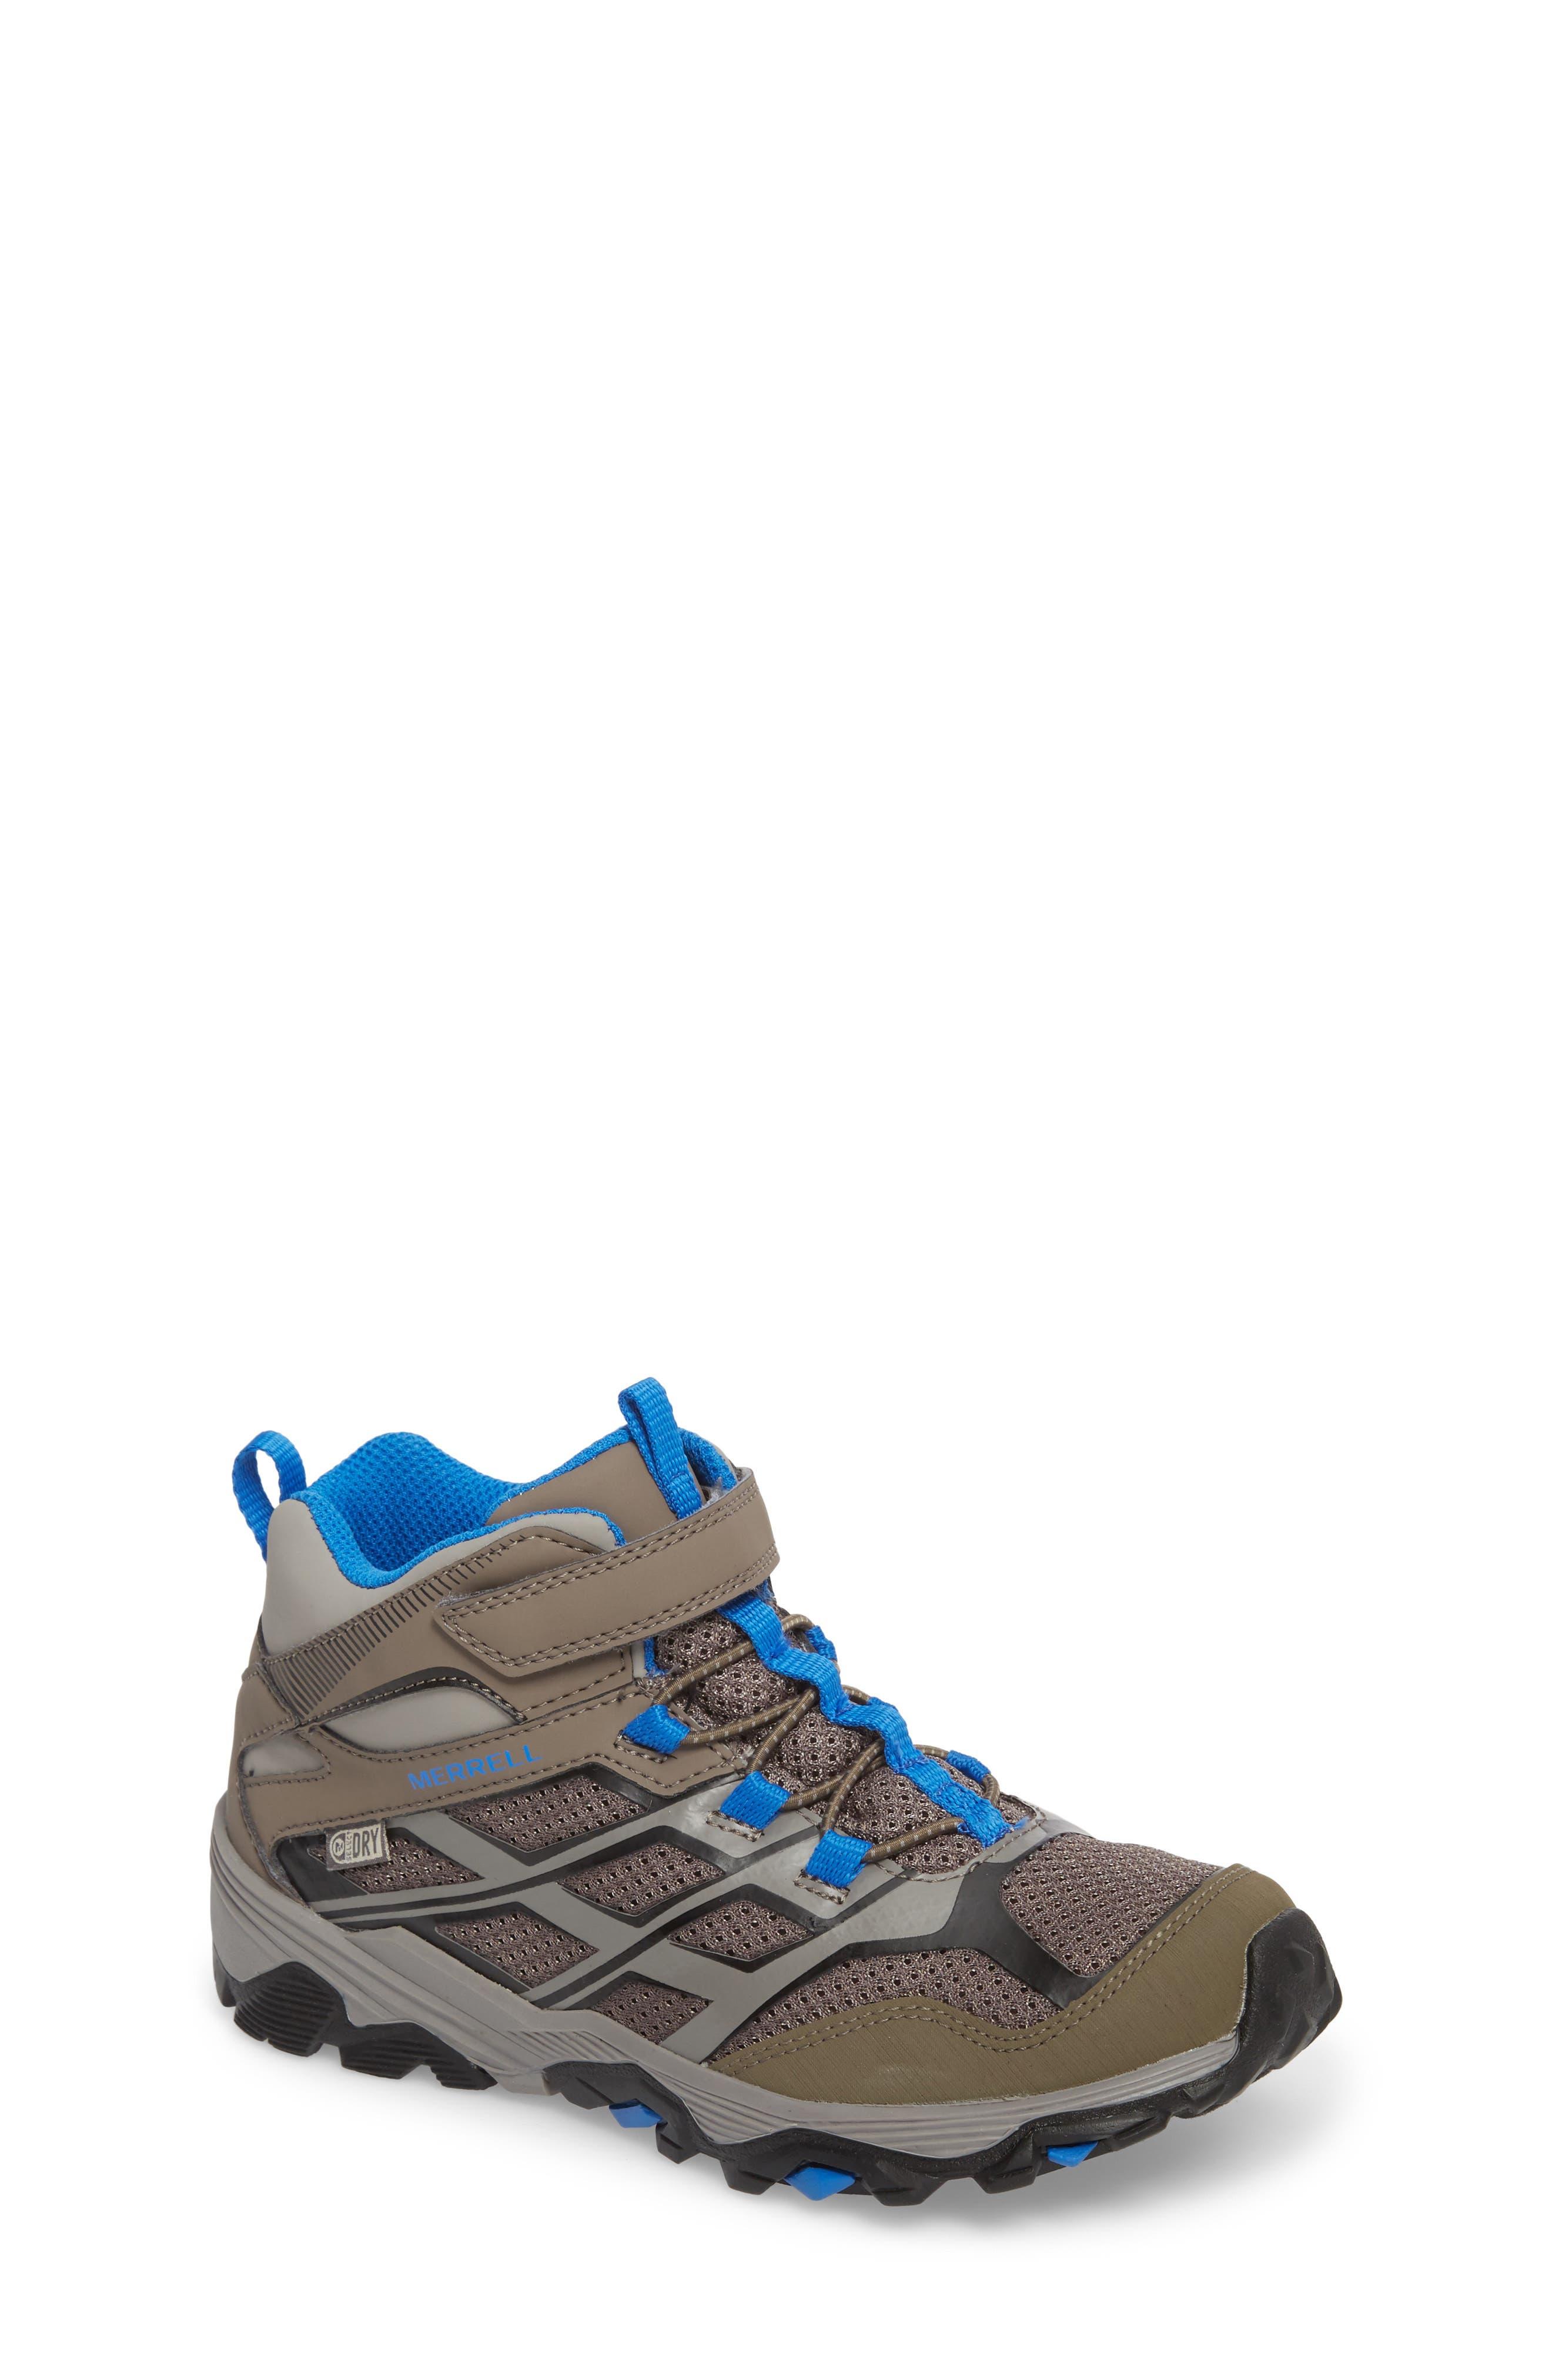 Main Image - Merrell Moab FST Mid Top Waterproof Sneaker Boot (Toddler, Little Kid & Big Kid)